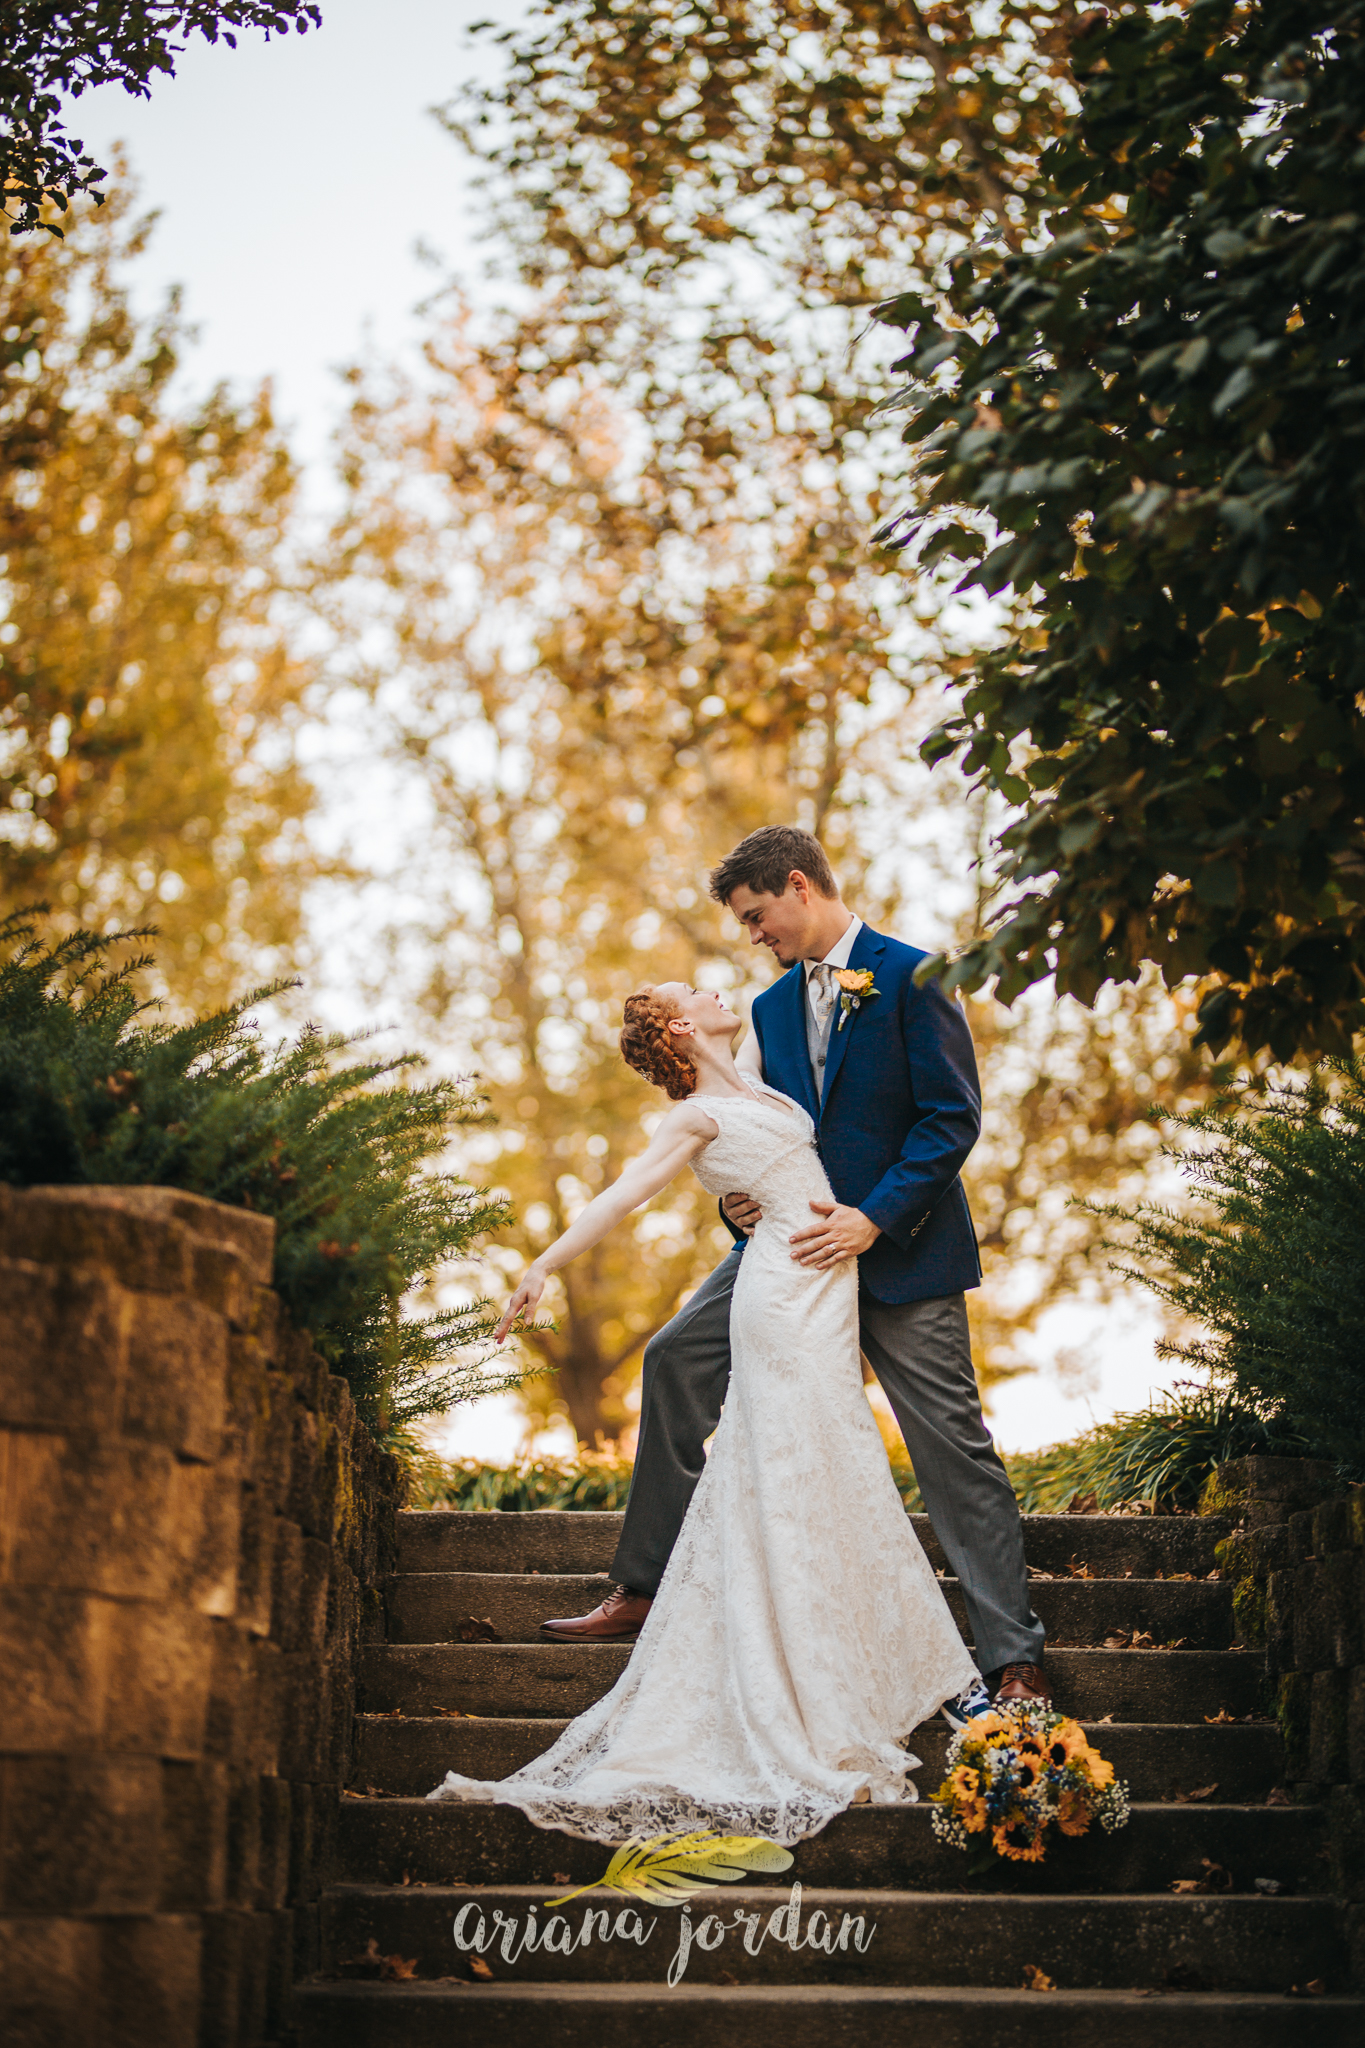 126 Ariana Jordan Photography -Moonlight Fields Lexington Ky Wedding Photographer 5095.jpg